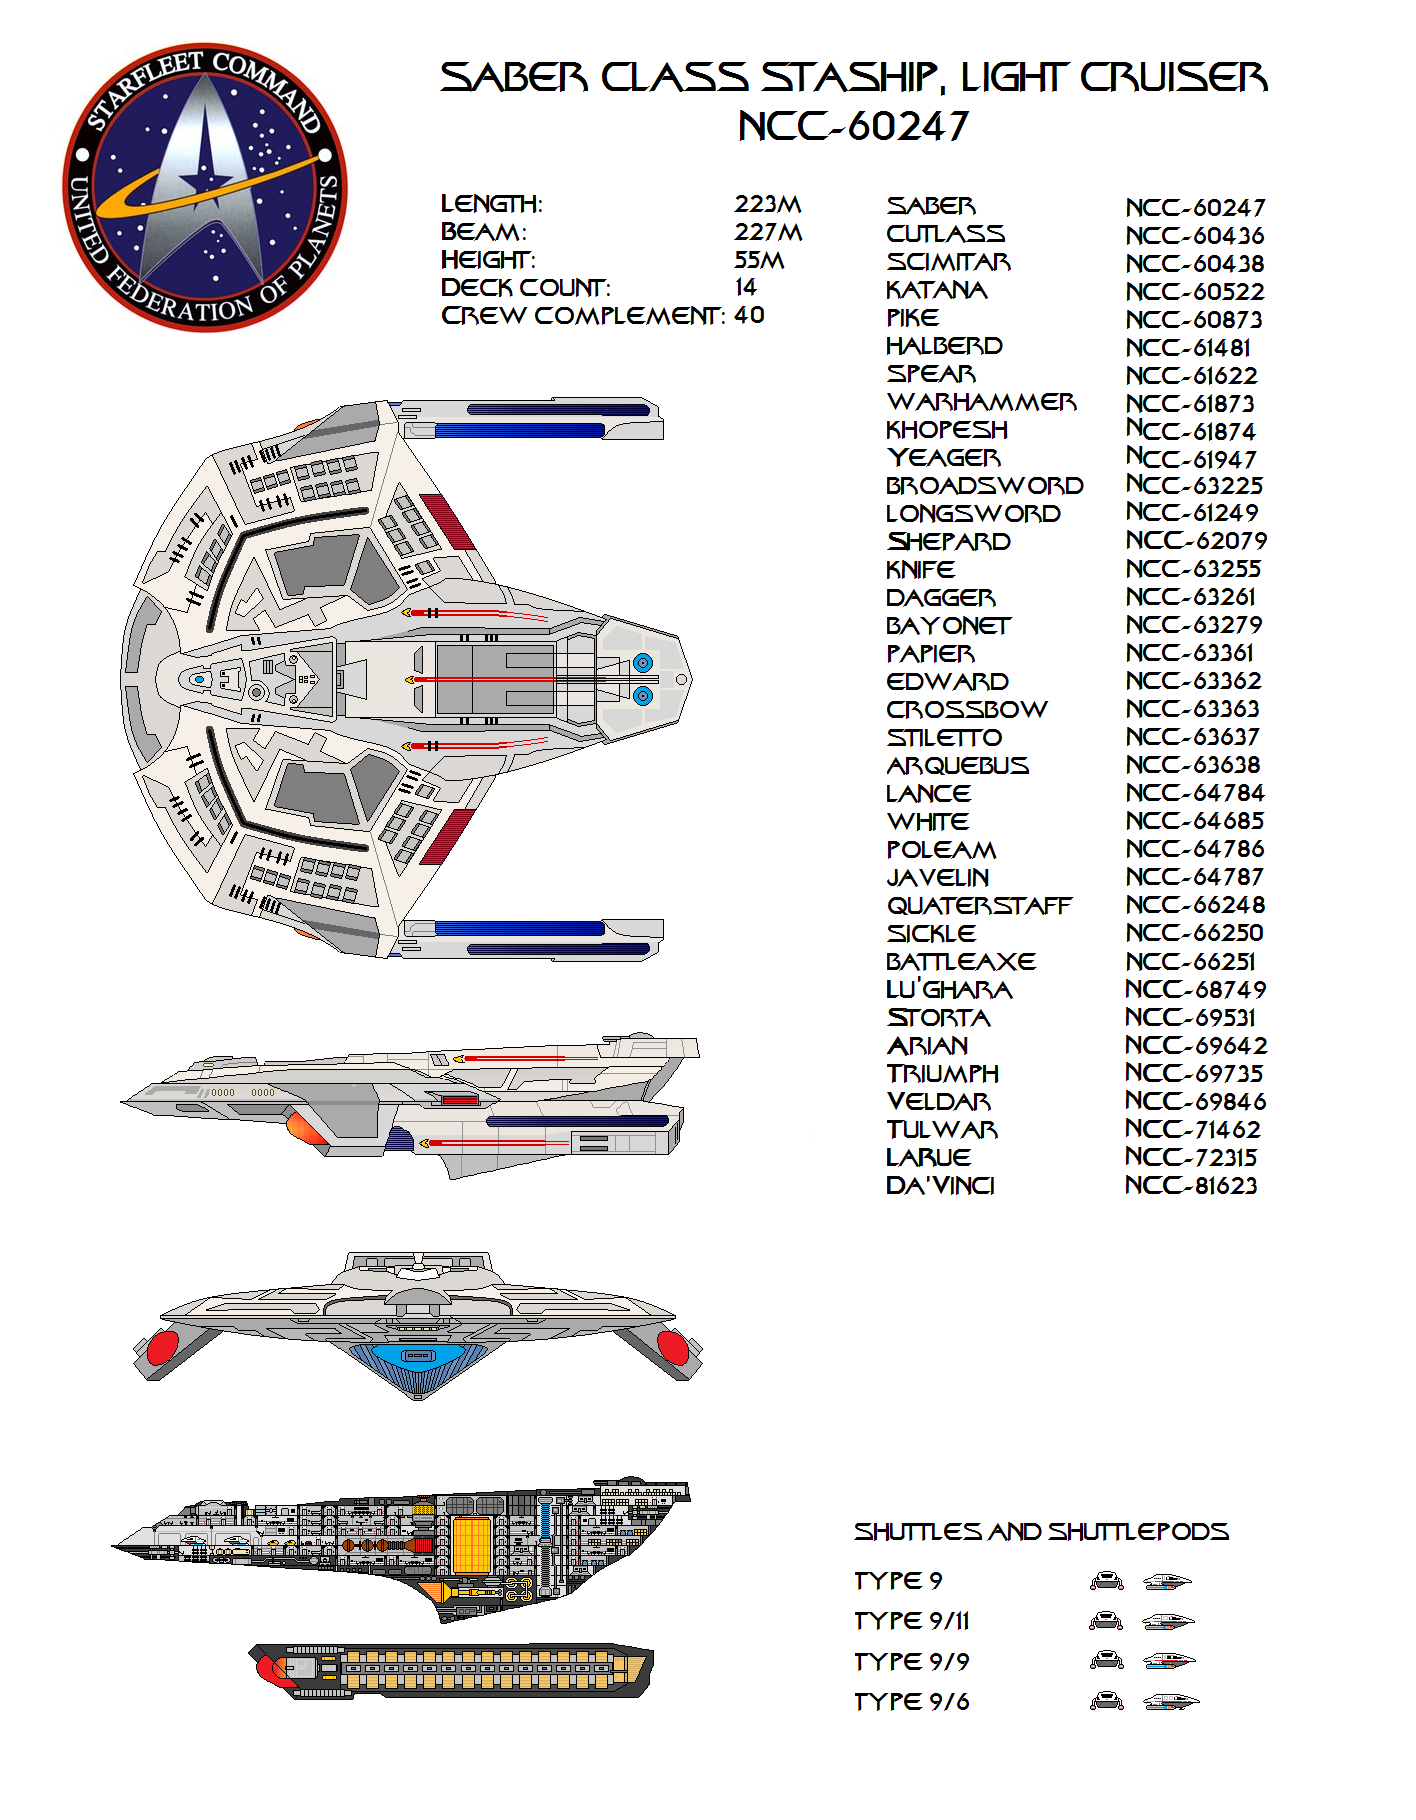 Saber class star ship. by jbobroony